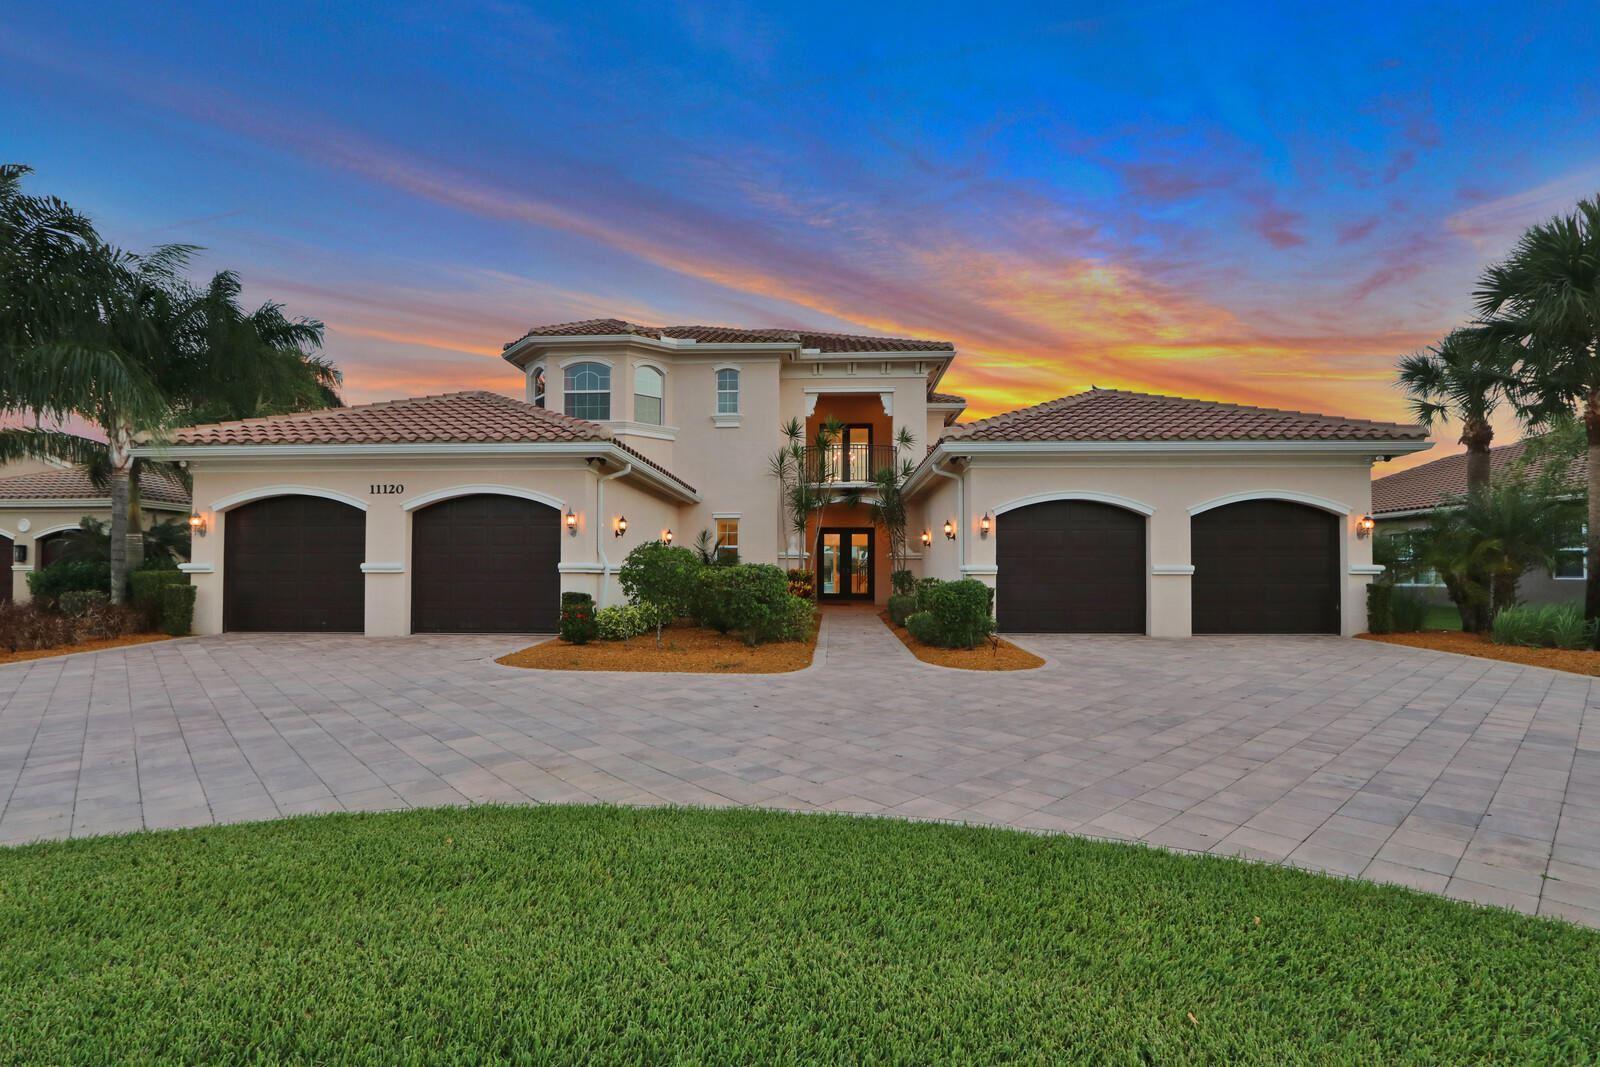 11120 Rockledge View Drive, Palm Beach Gardens, FL 33412 - MLS#: RX-10717618